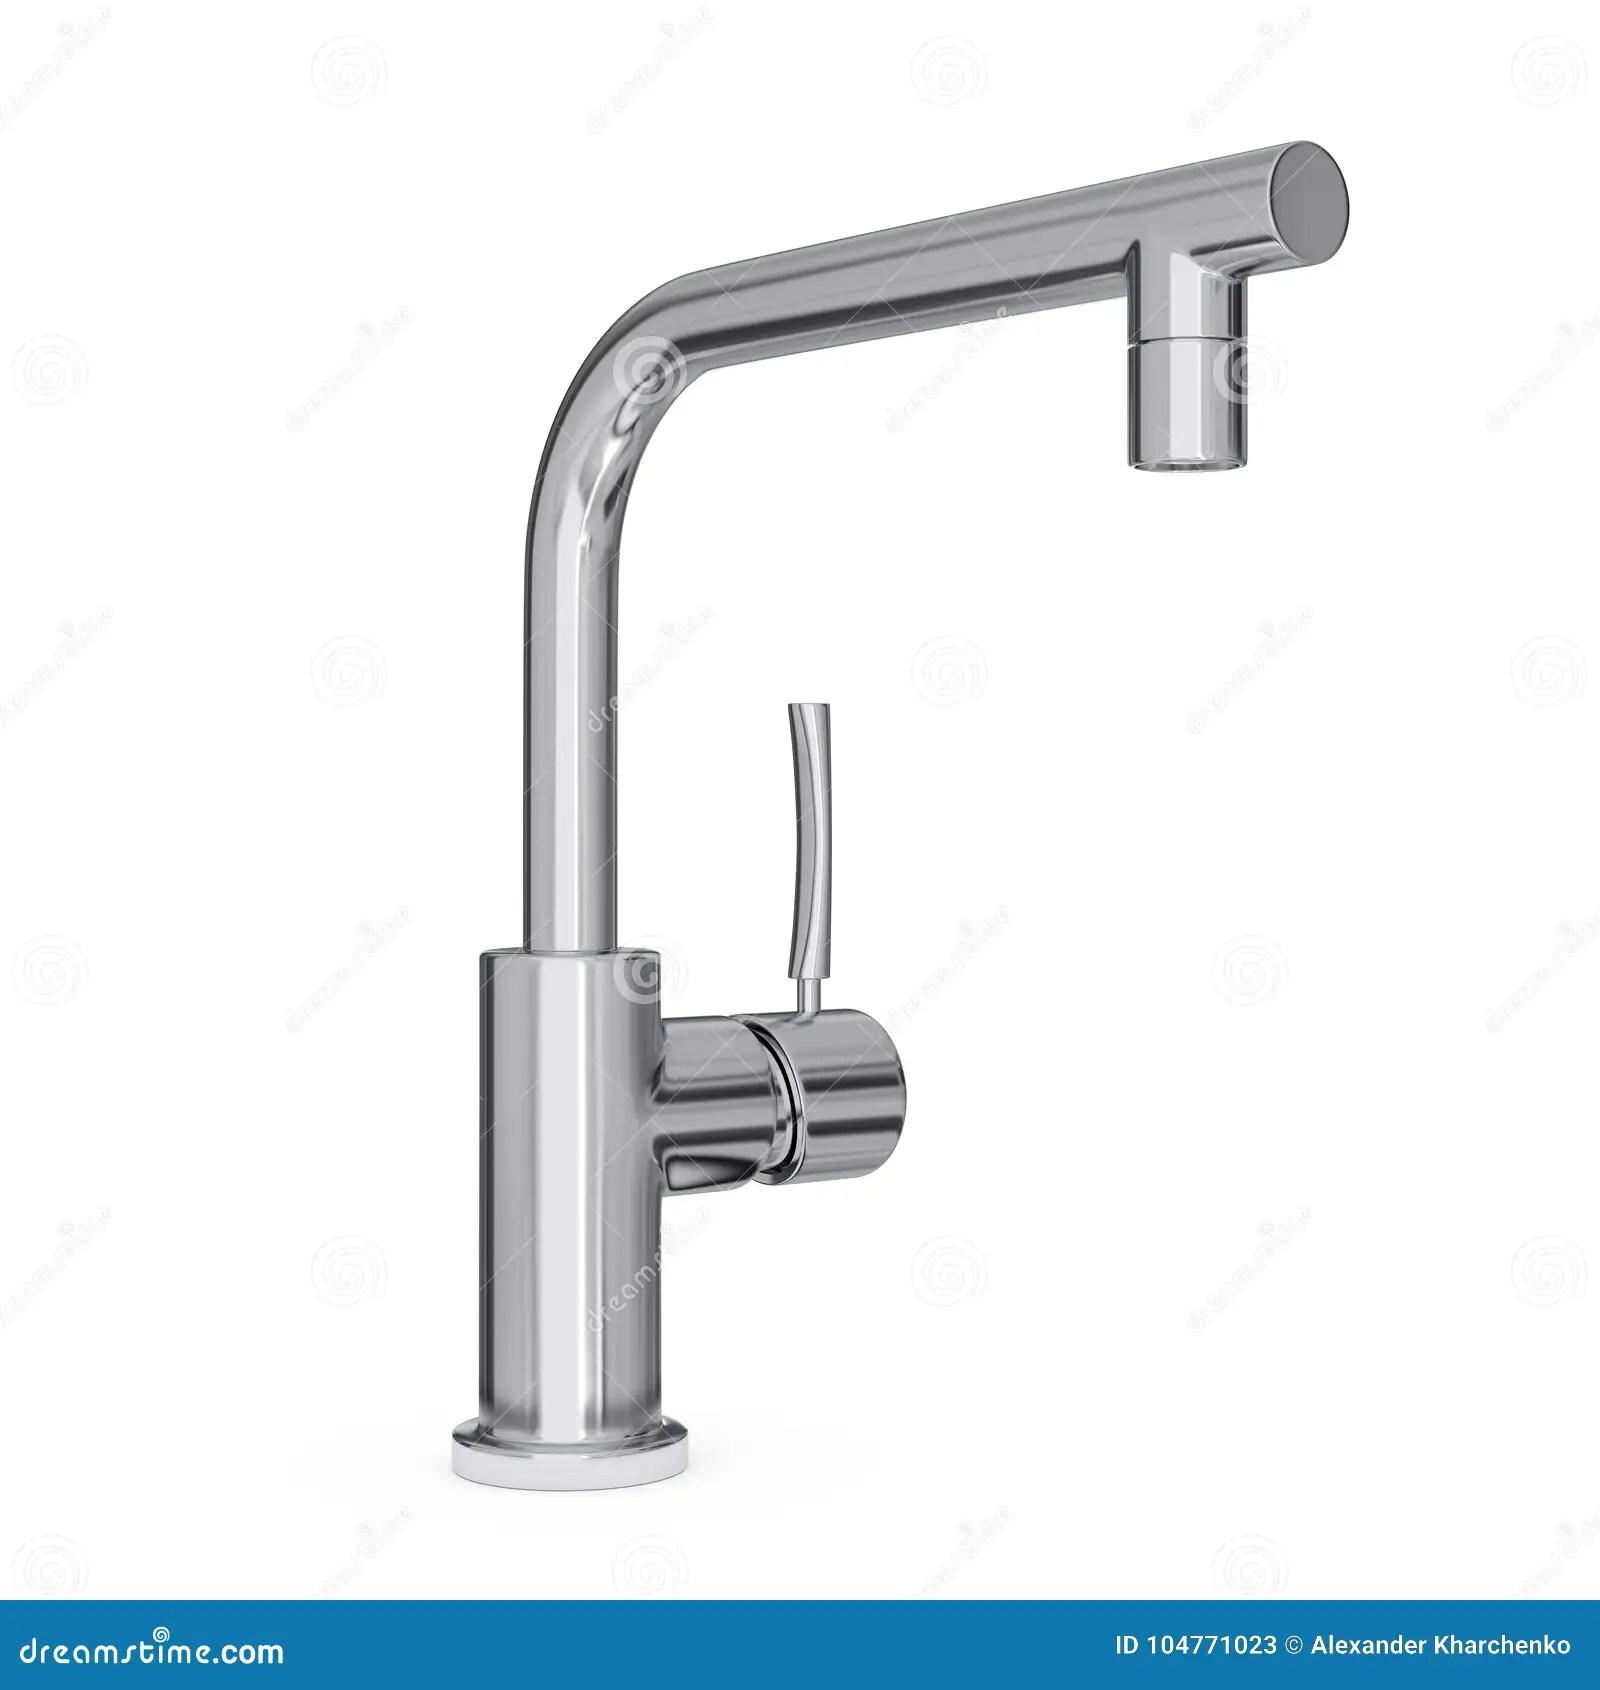 stainless steel kitchen faucets target appliances 现代不锈钢厨房水龙头 龙头3d翻译库存例证 插画包括有流体 烤肉 例证 在白色背景的龙头3d翻译